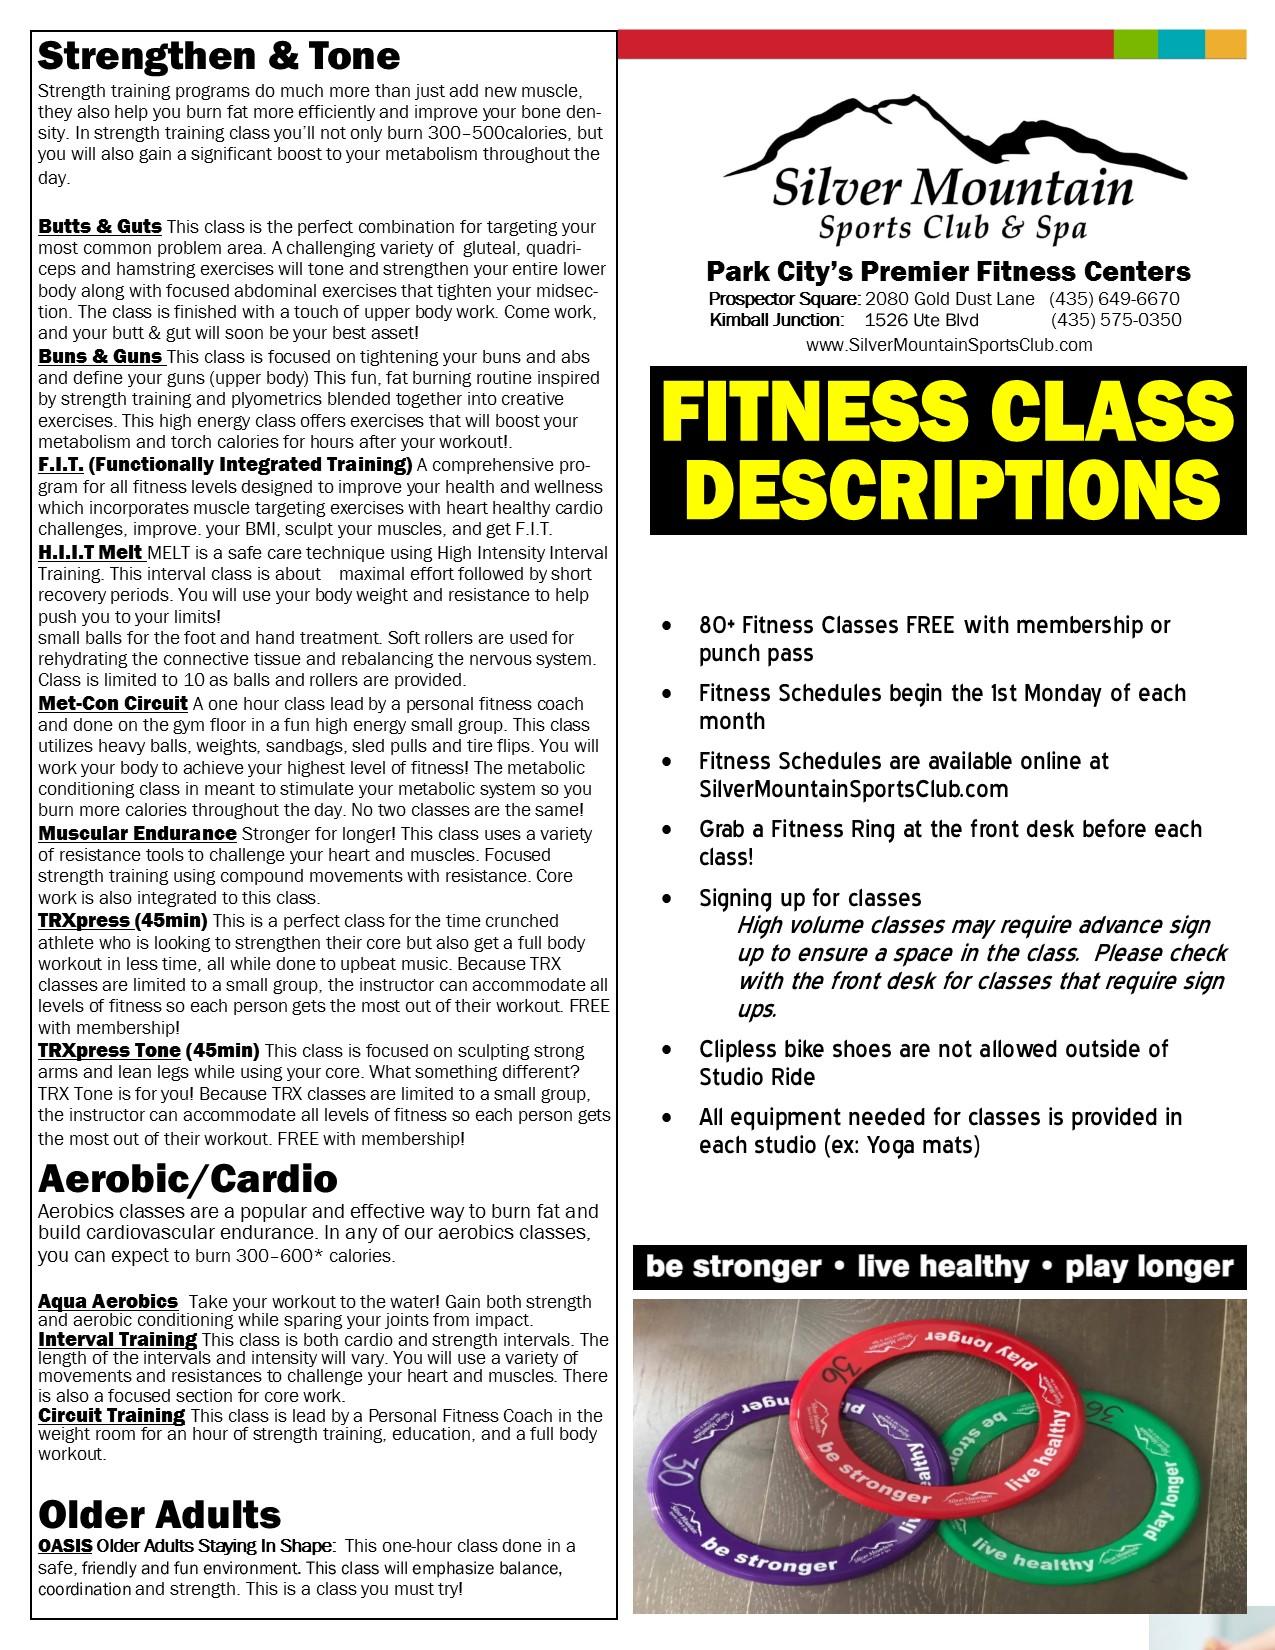 Class Descriptions Page 1 - JPEG.jpg